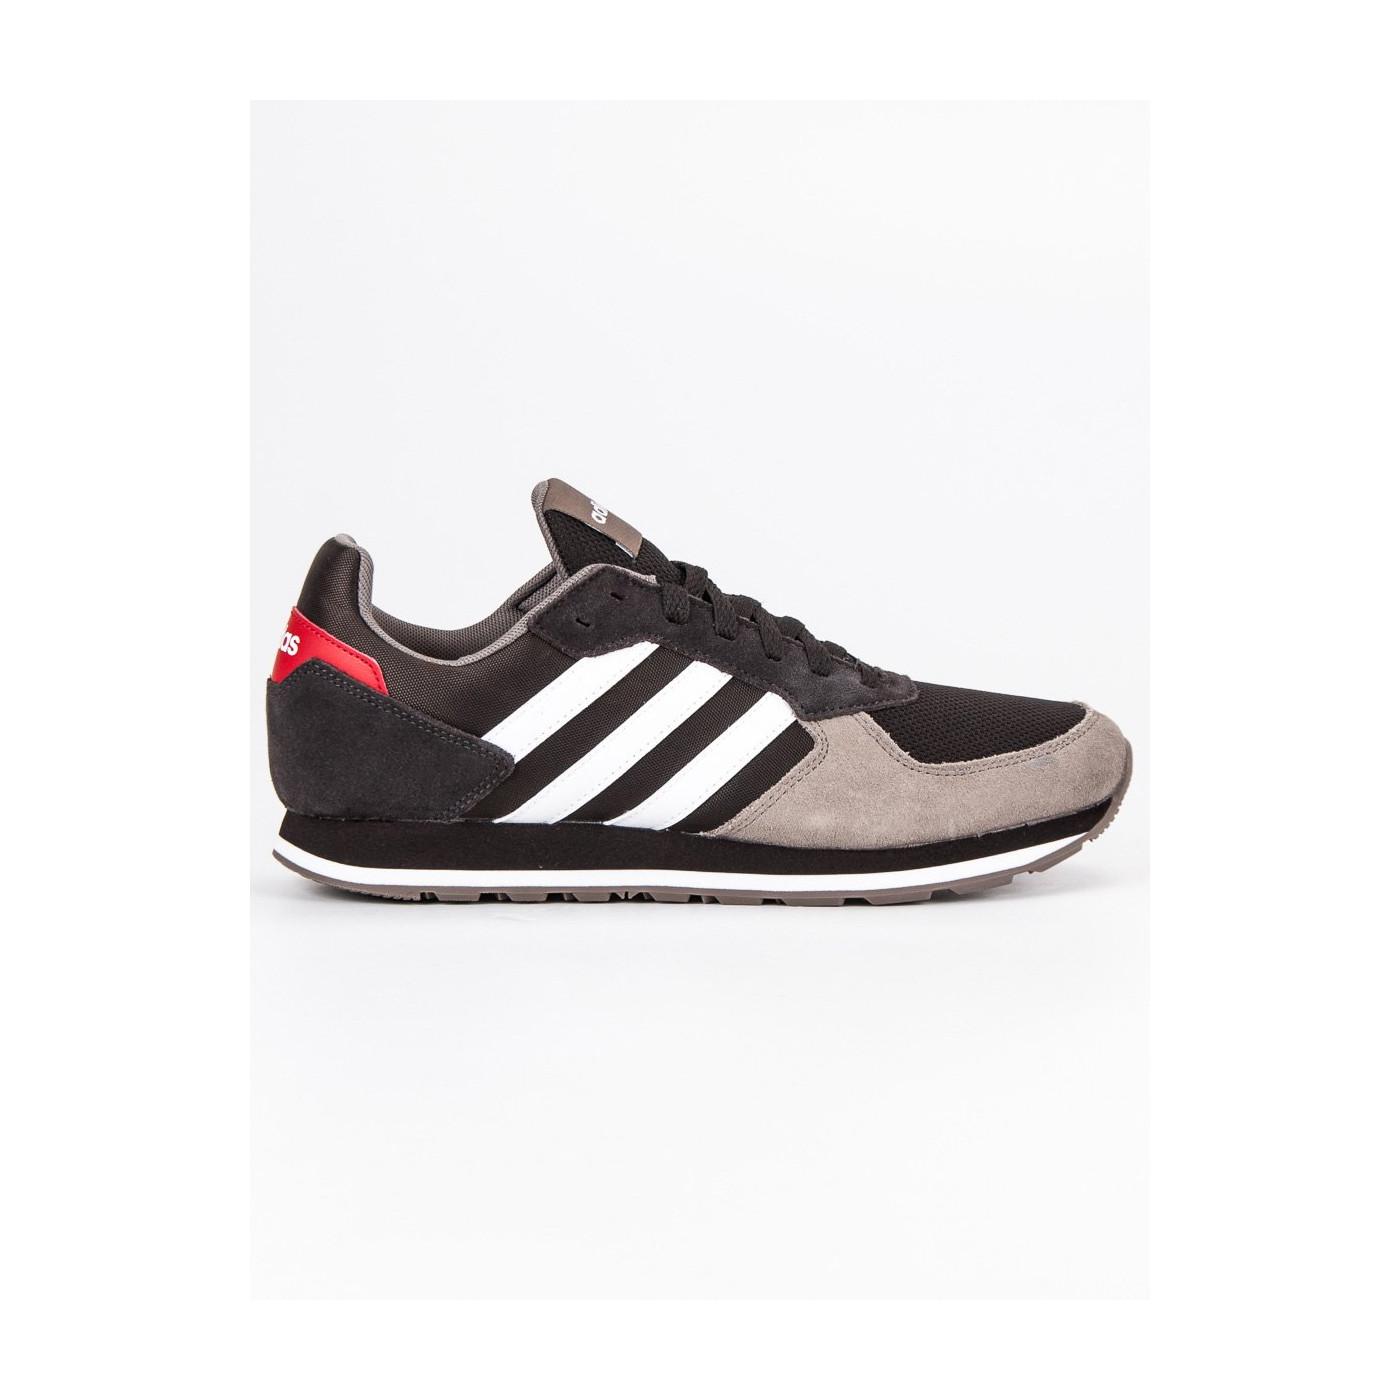 3f72b915e6d Sneakersid - FACTCOOL